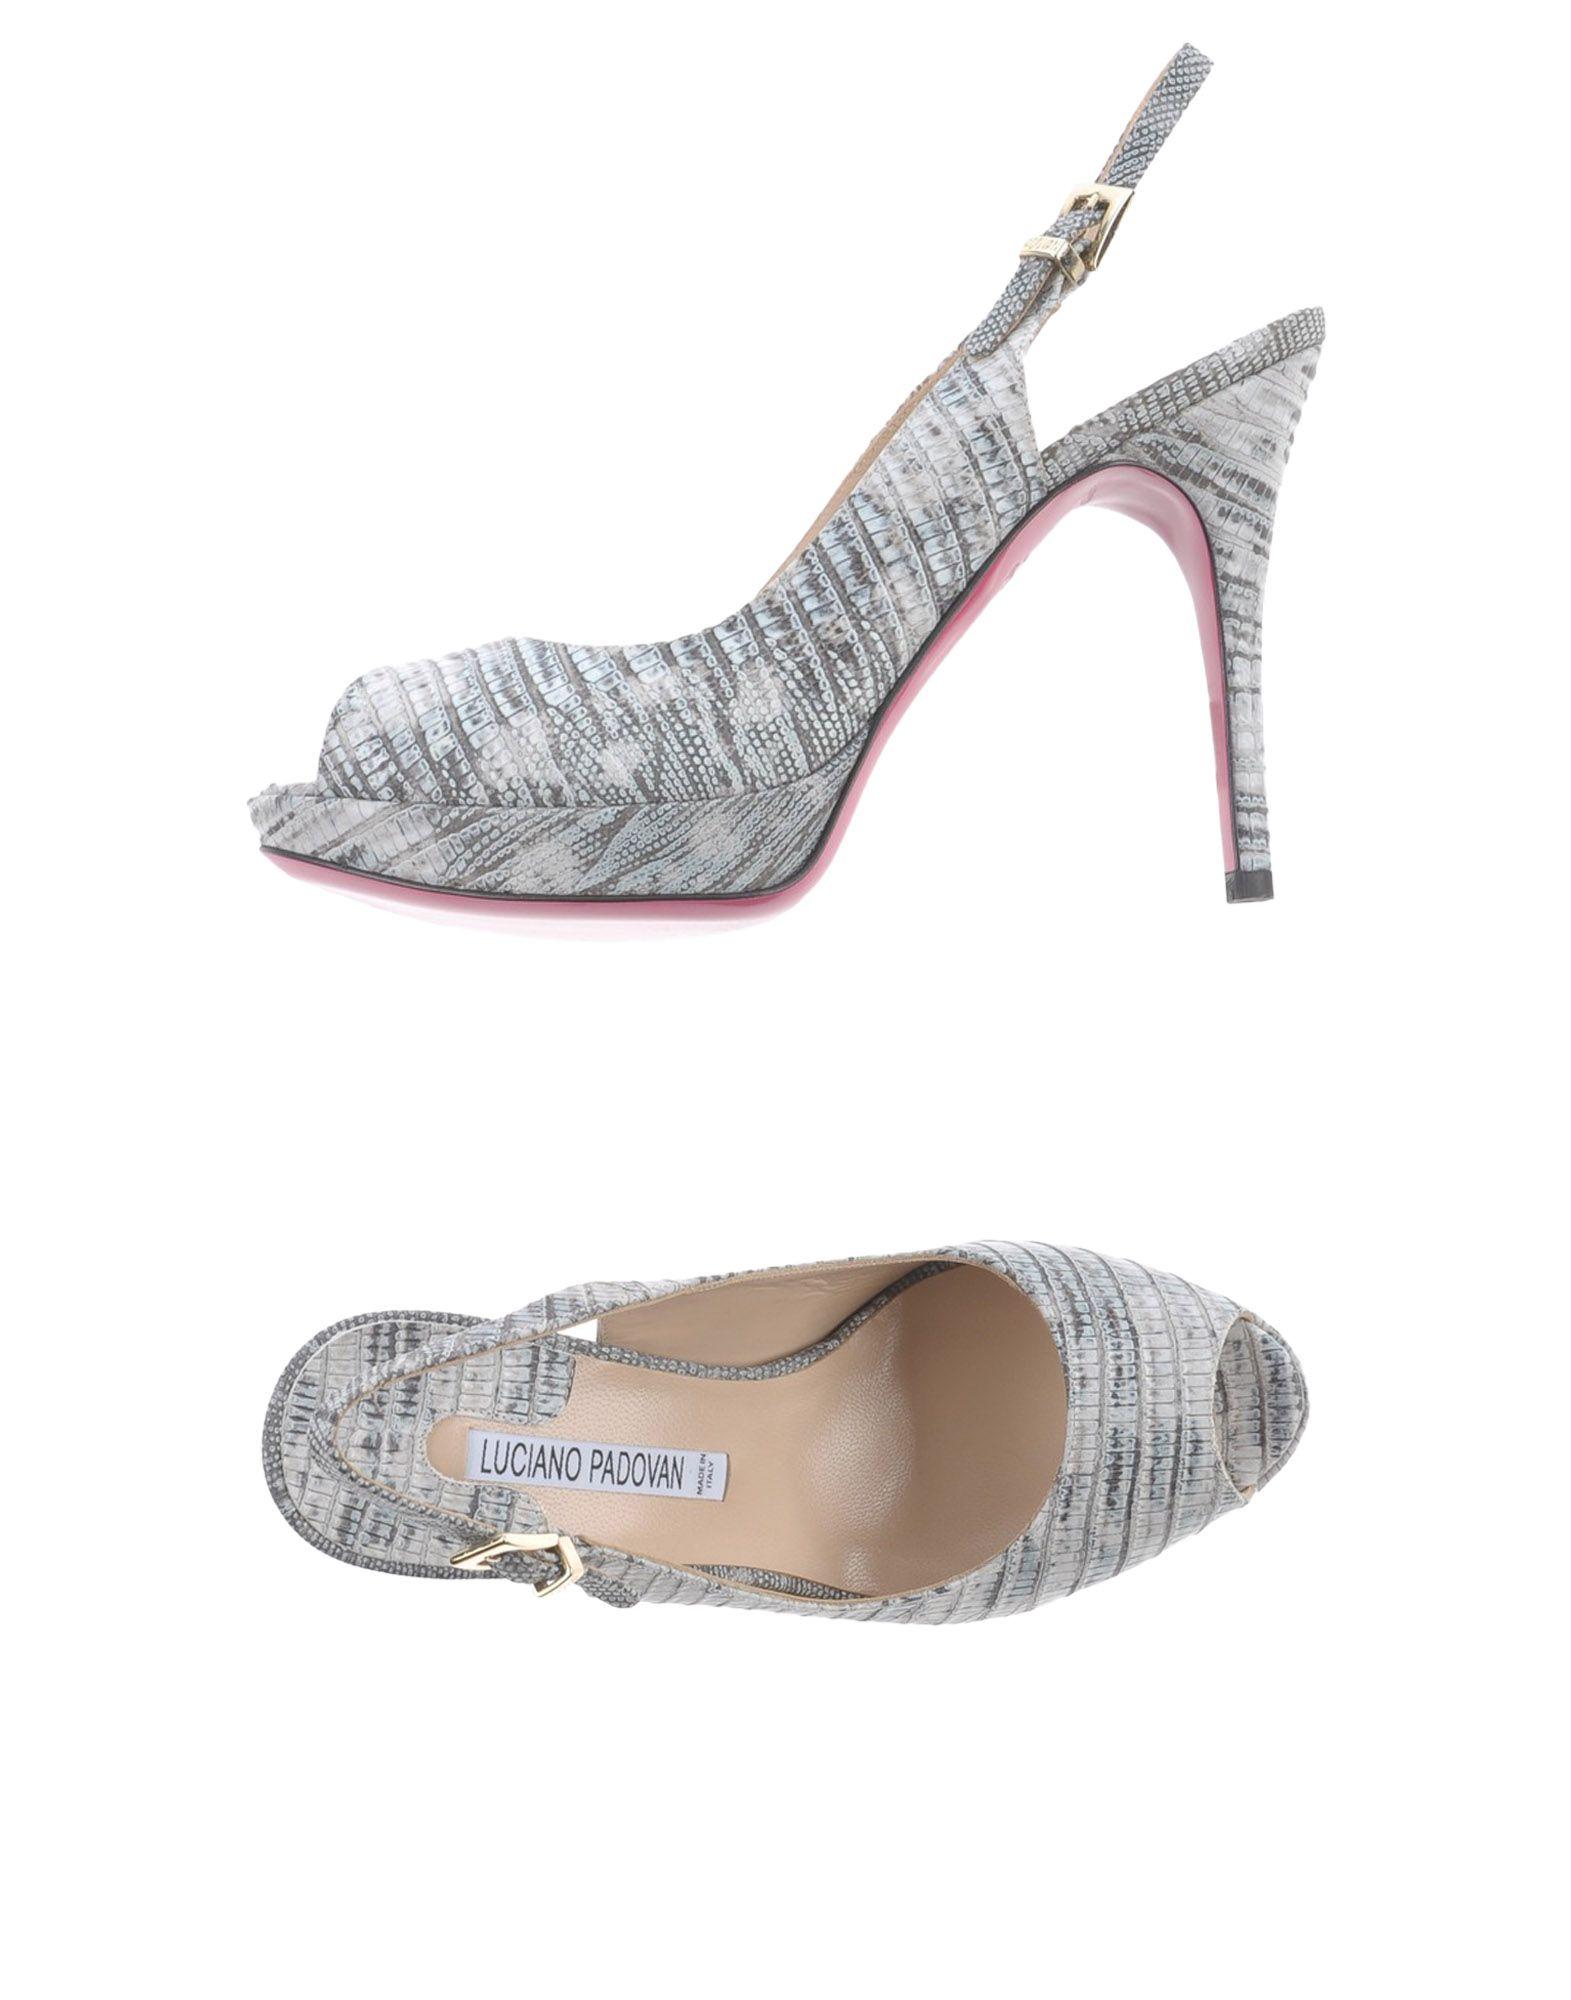 Stilvolle billige Schuhe Luciano Padovan 11039291LV Sandalen Damen  11039291LV Padovan 5e9d9f